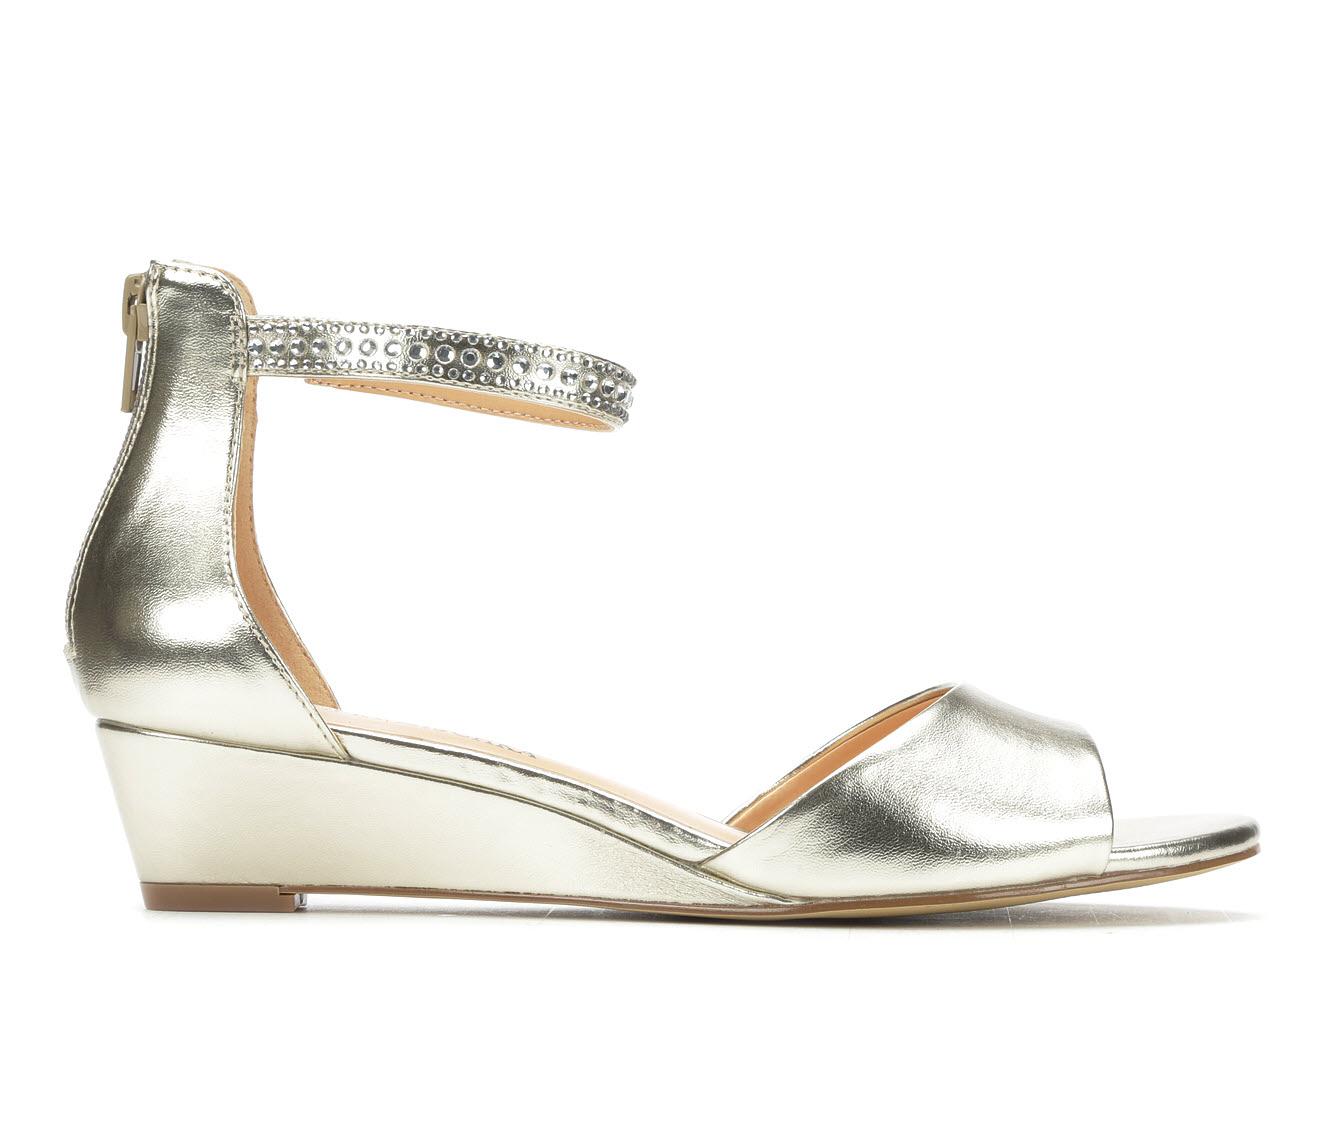 American Glamour BadgleyM Xena Women's Dress Shoe (Gold Faux Leather)